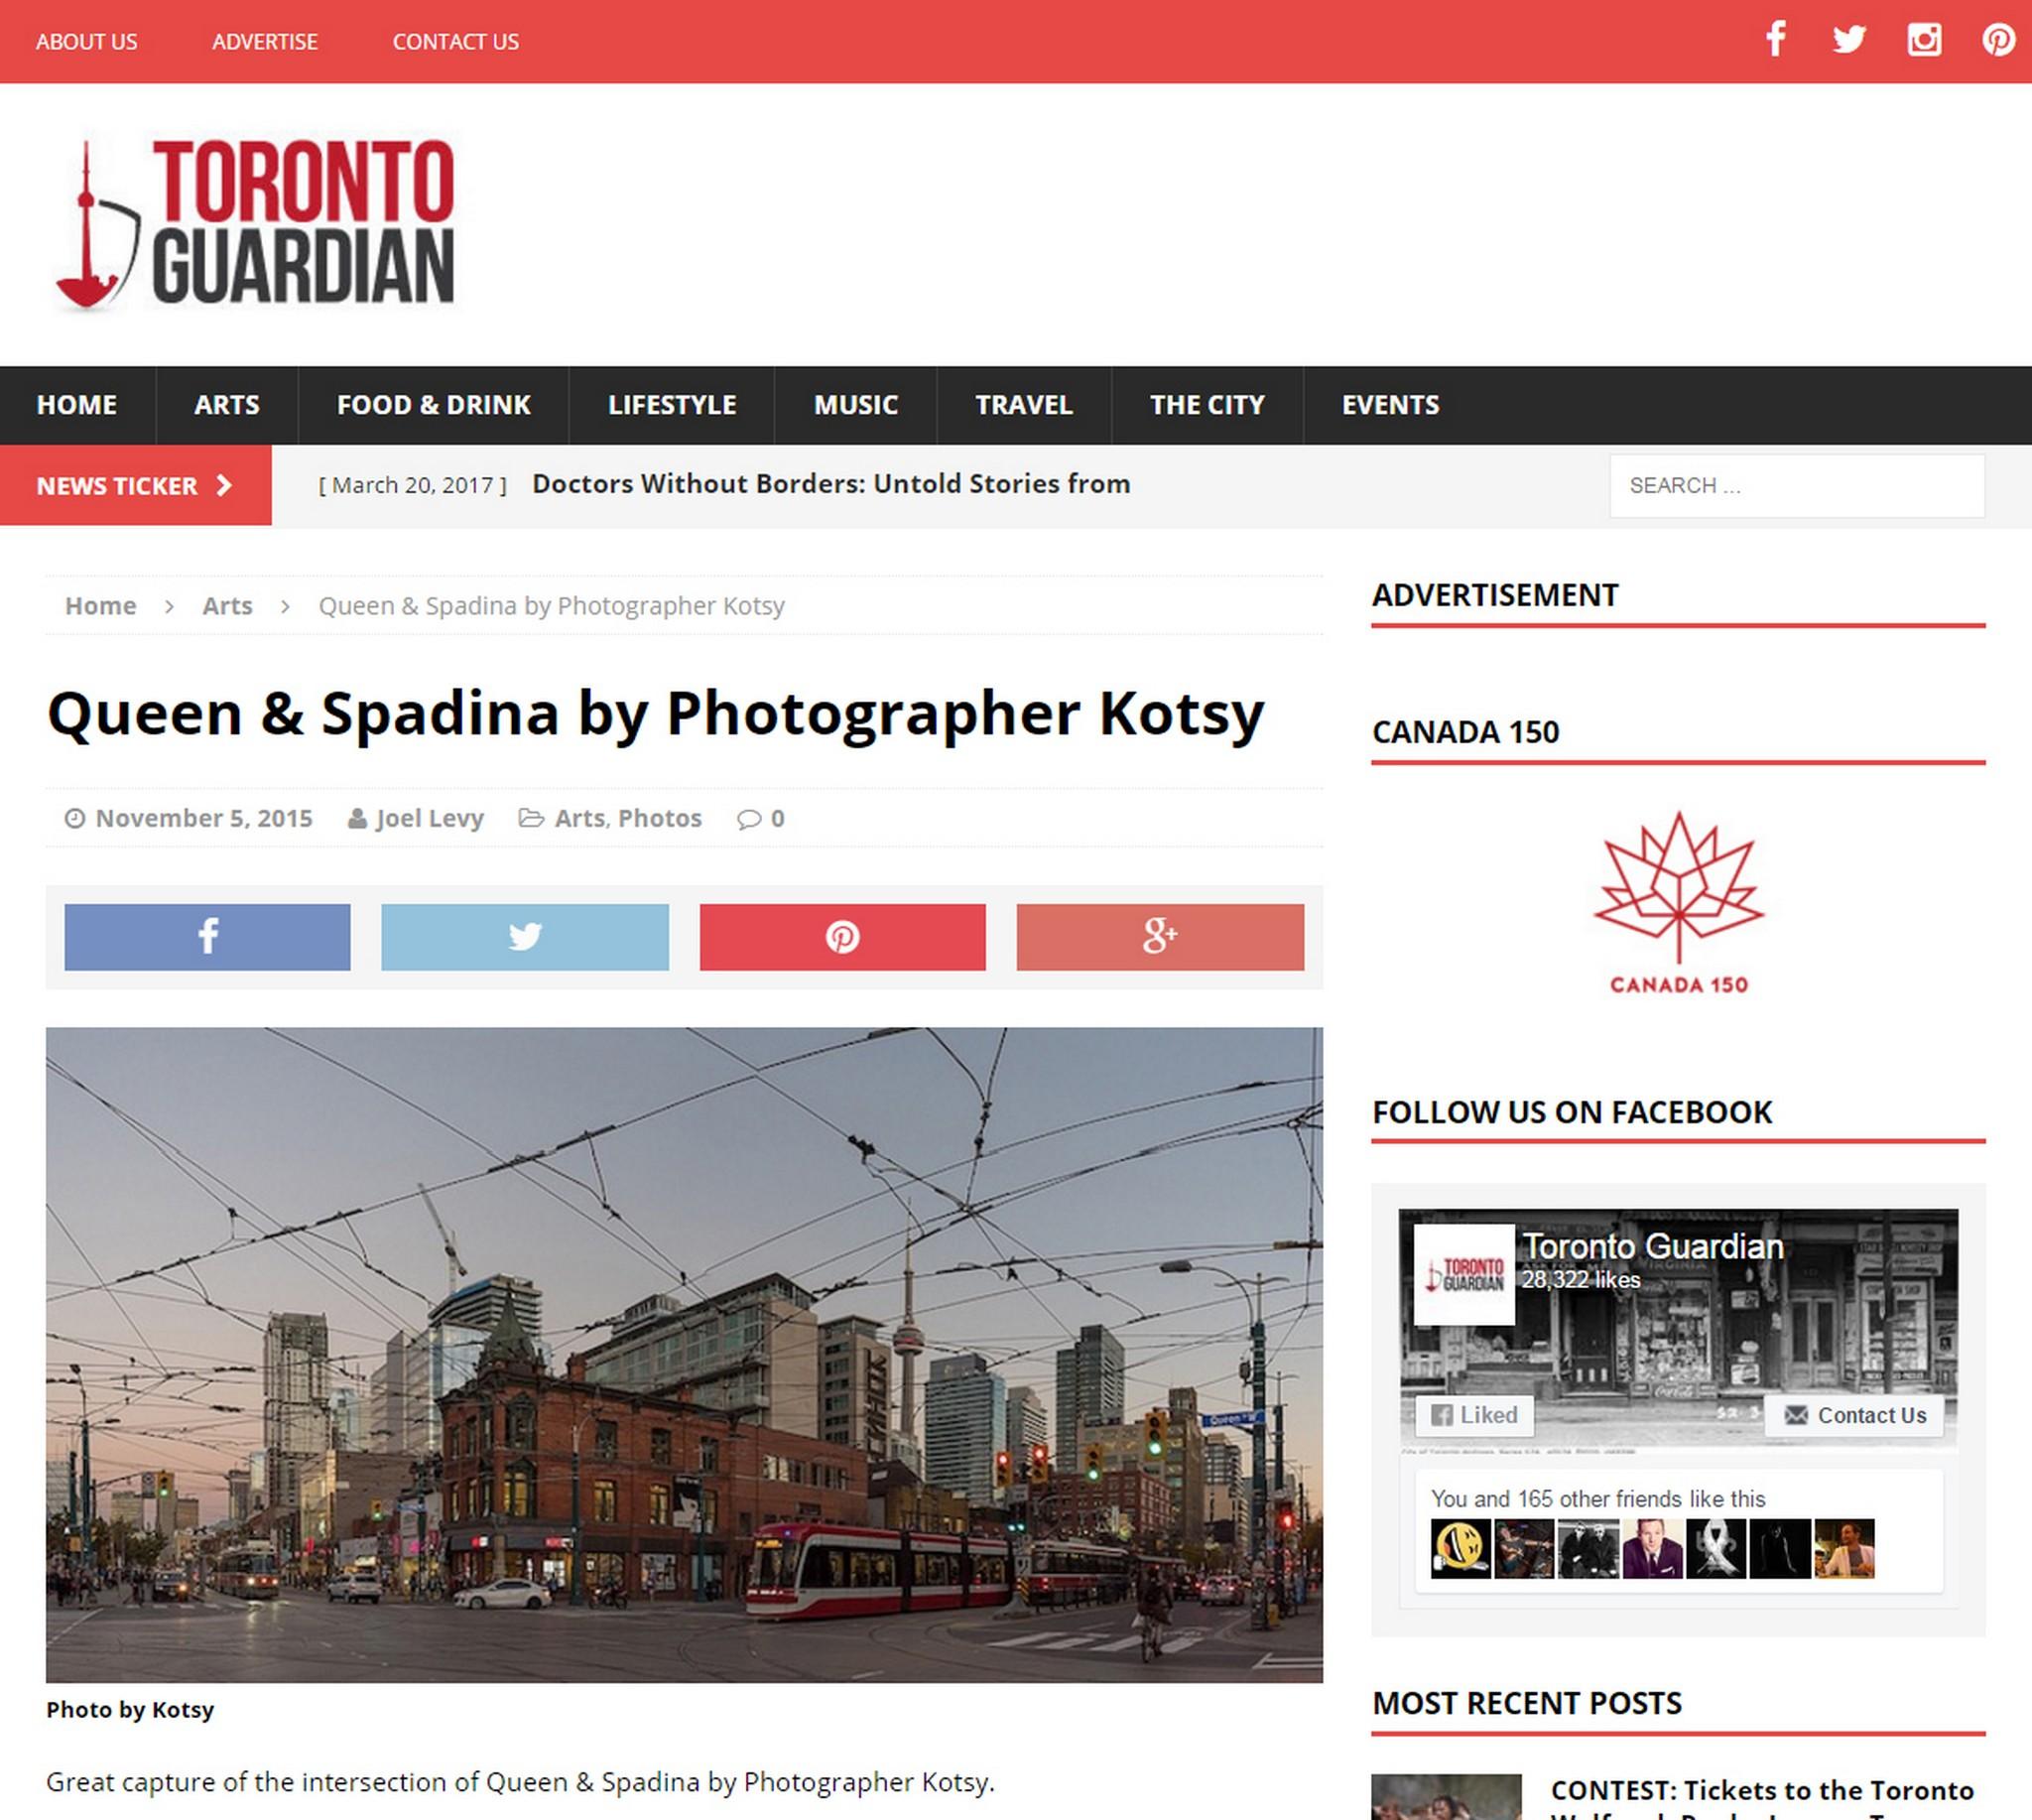 2015-11-05-Toronto Guardian.jpg